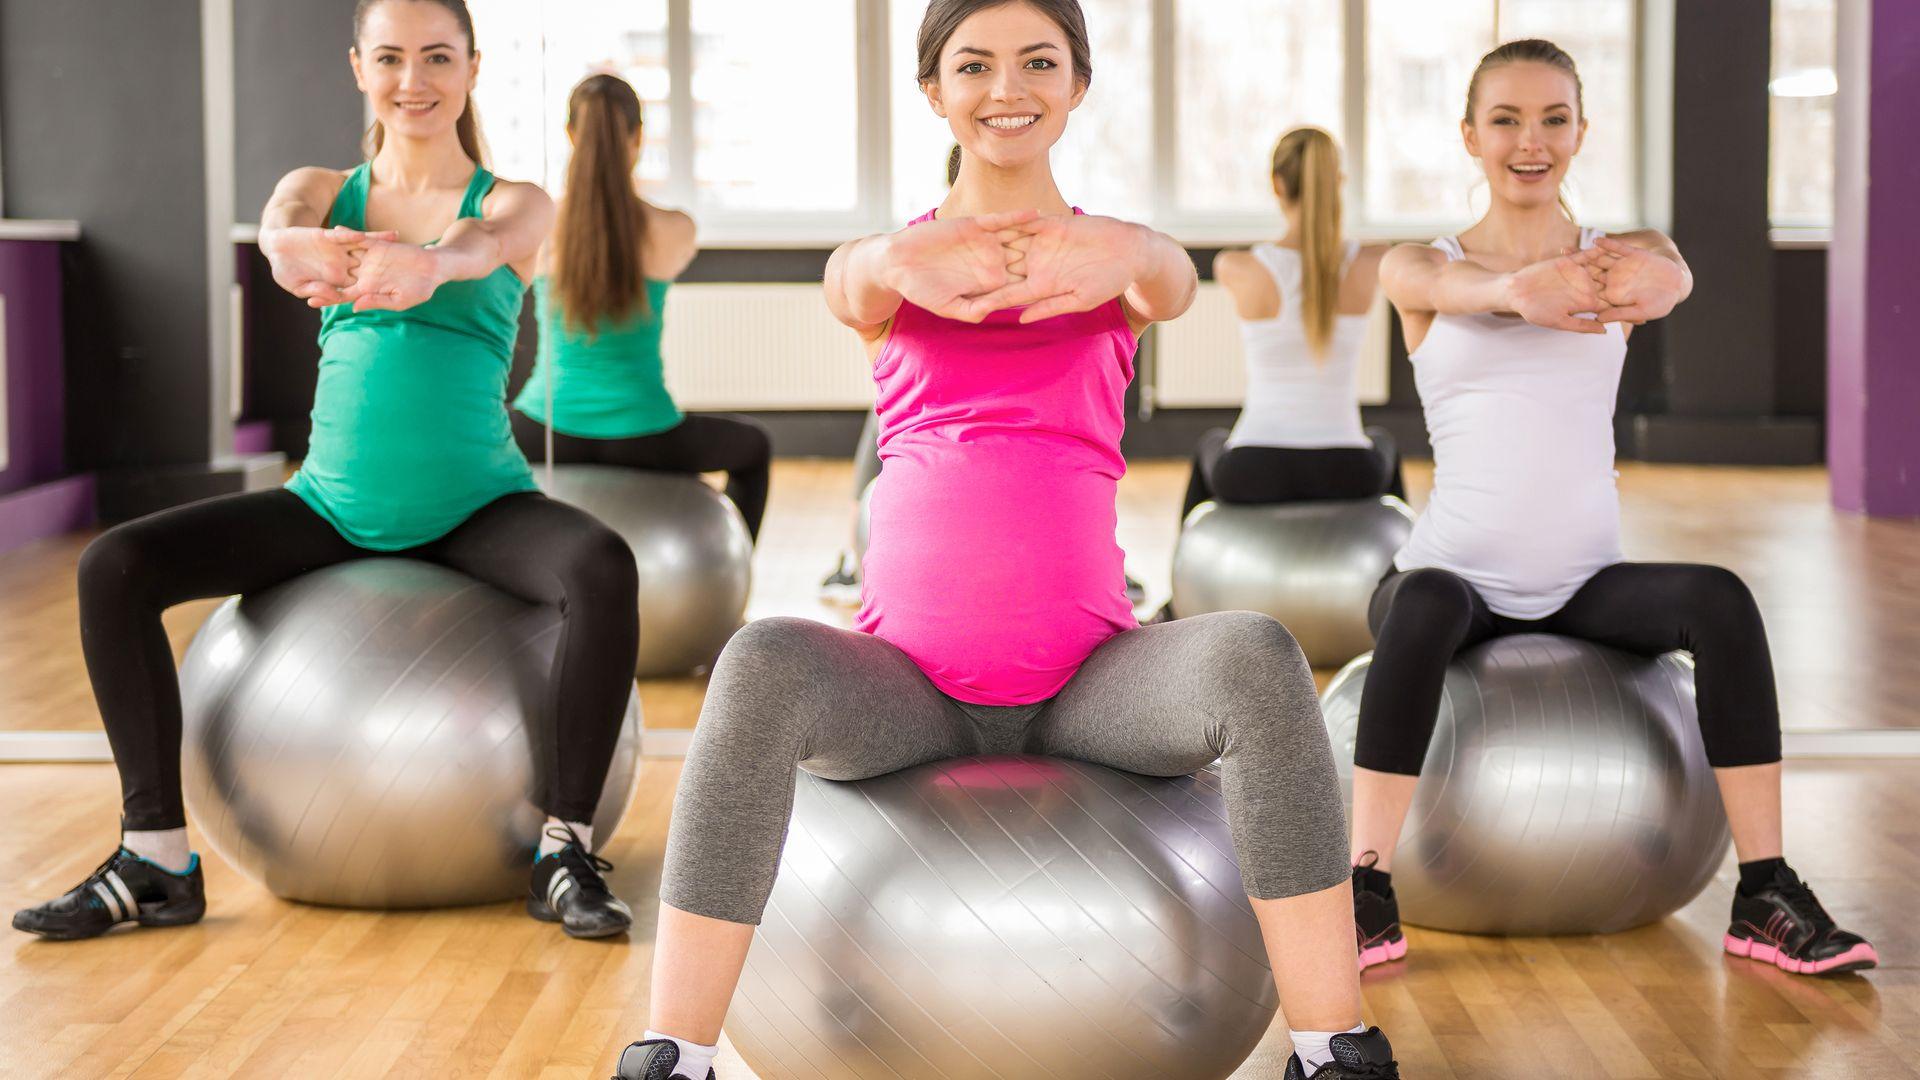 bigstock-Pregnant-Women-Fitness-89045711